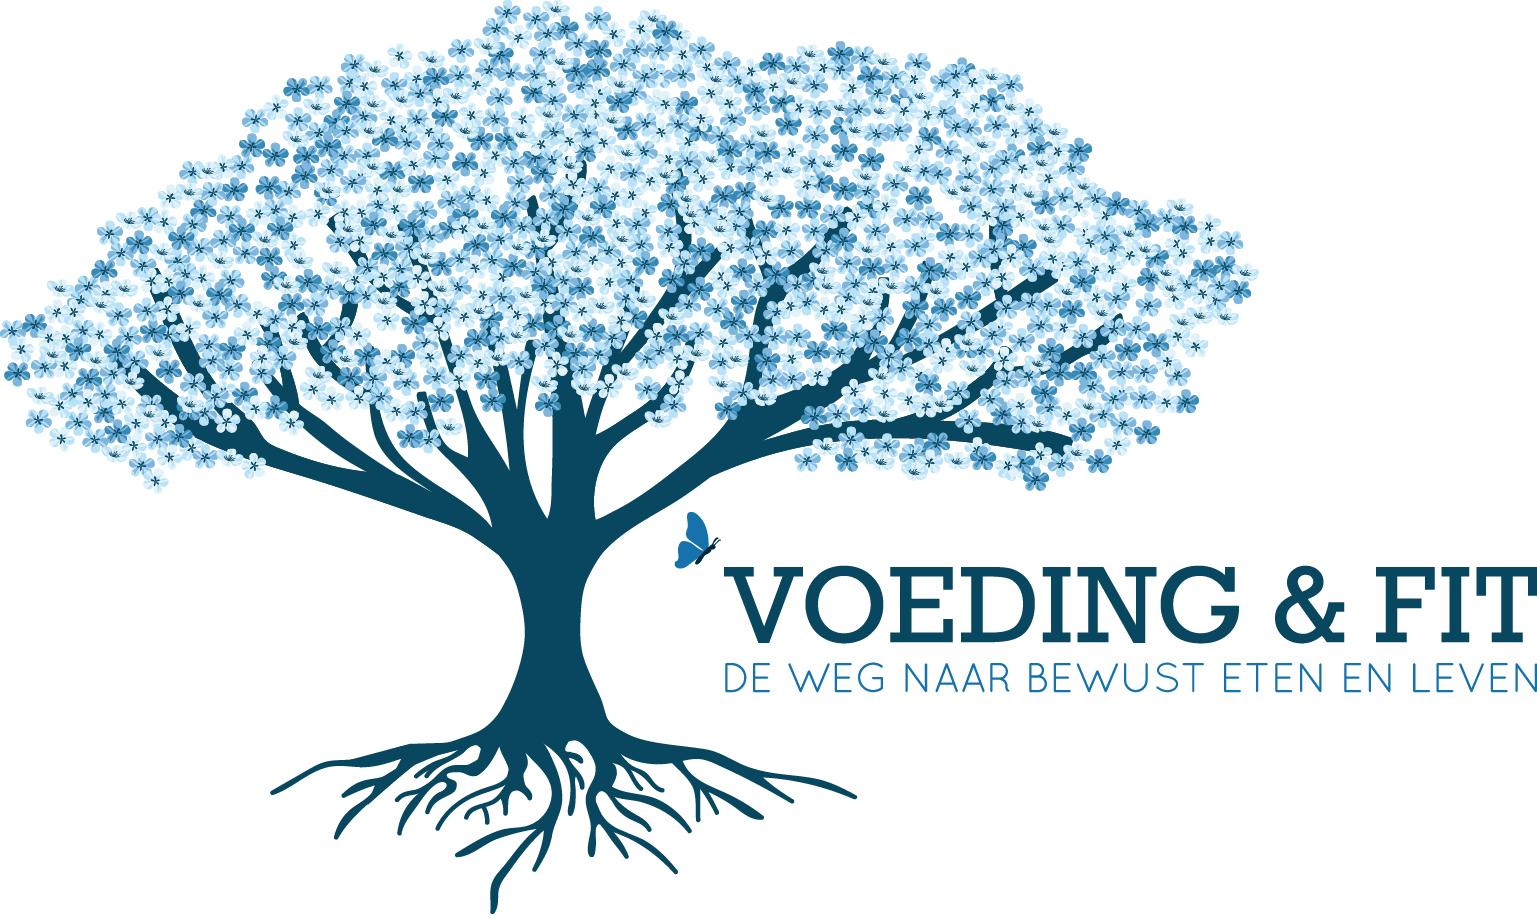 Logo voeding en fit slogan